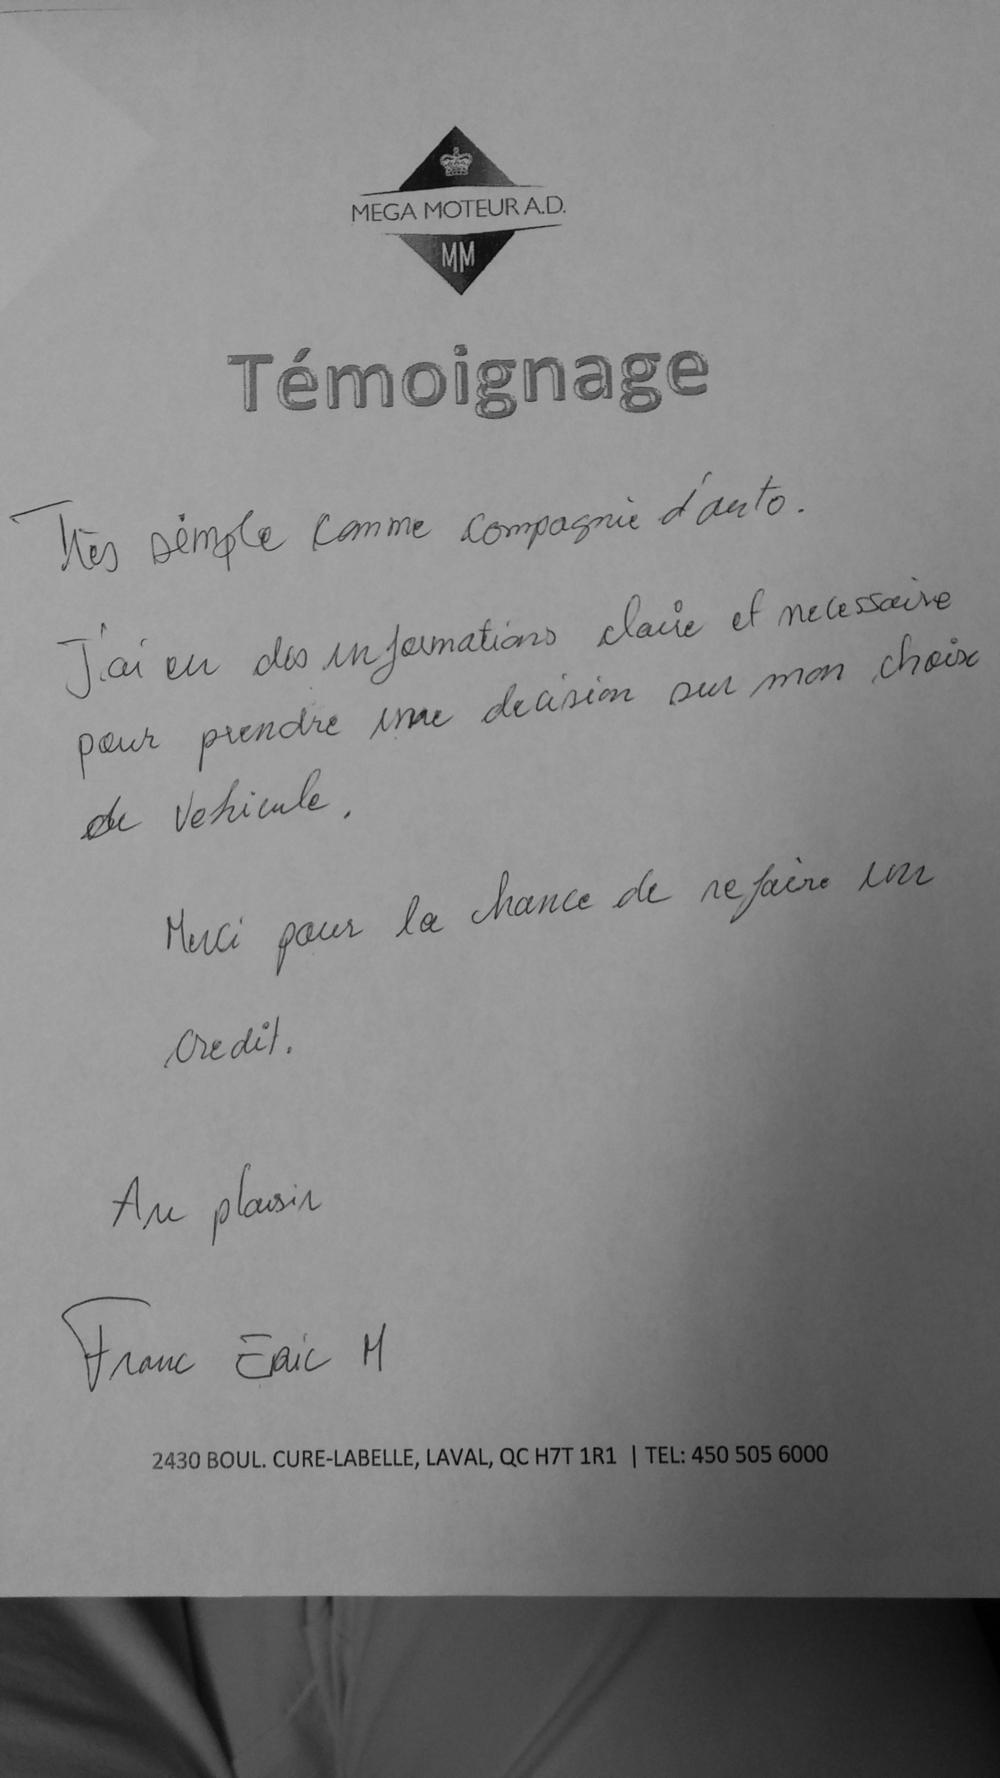 FRANC ERIC MOUNKAM_Testimonial.jpg